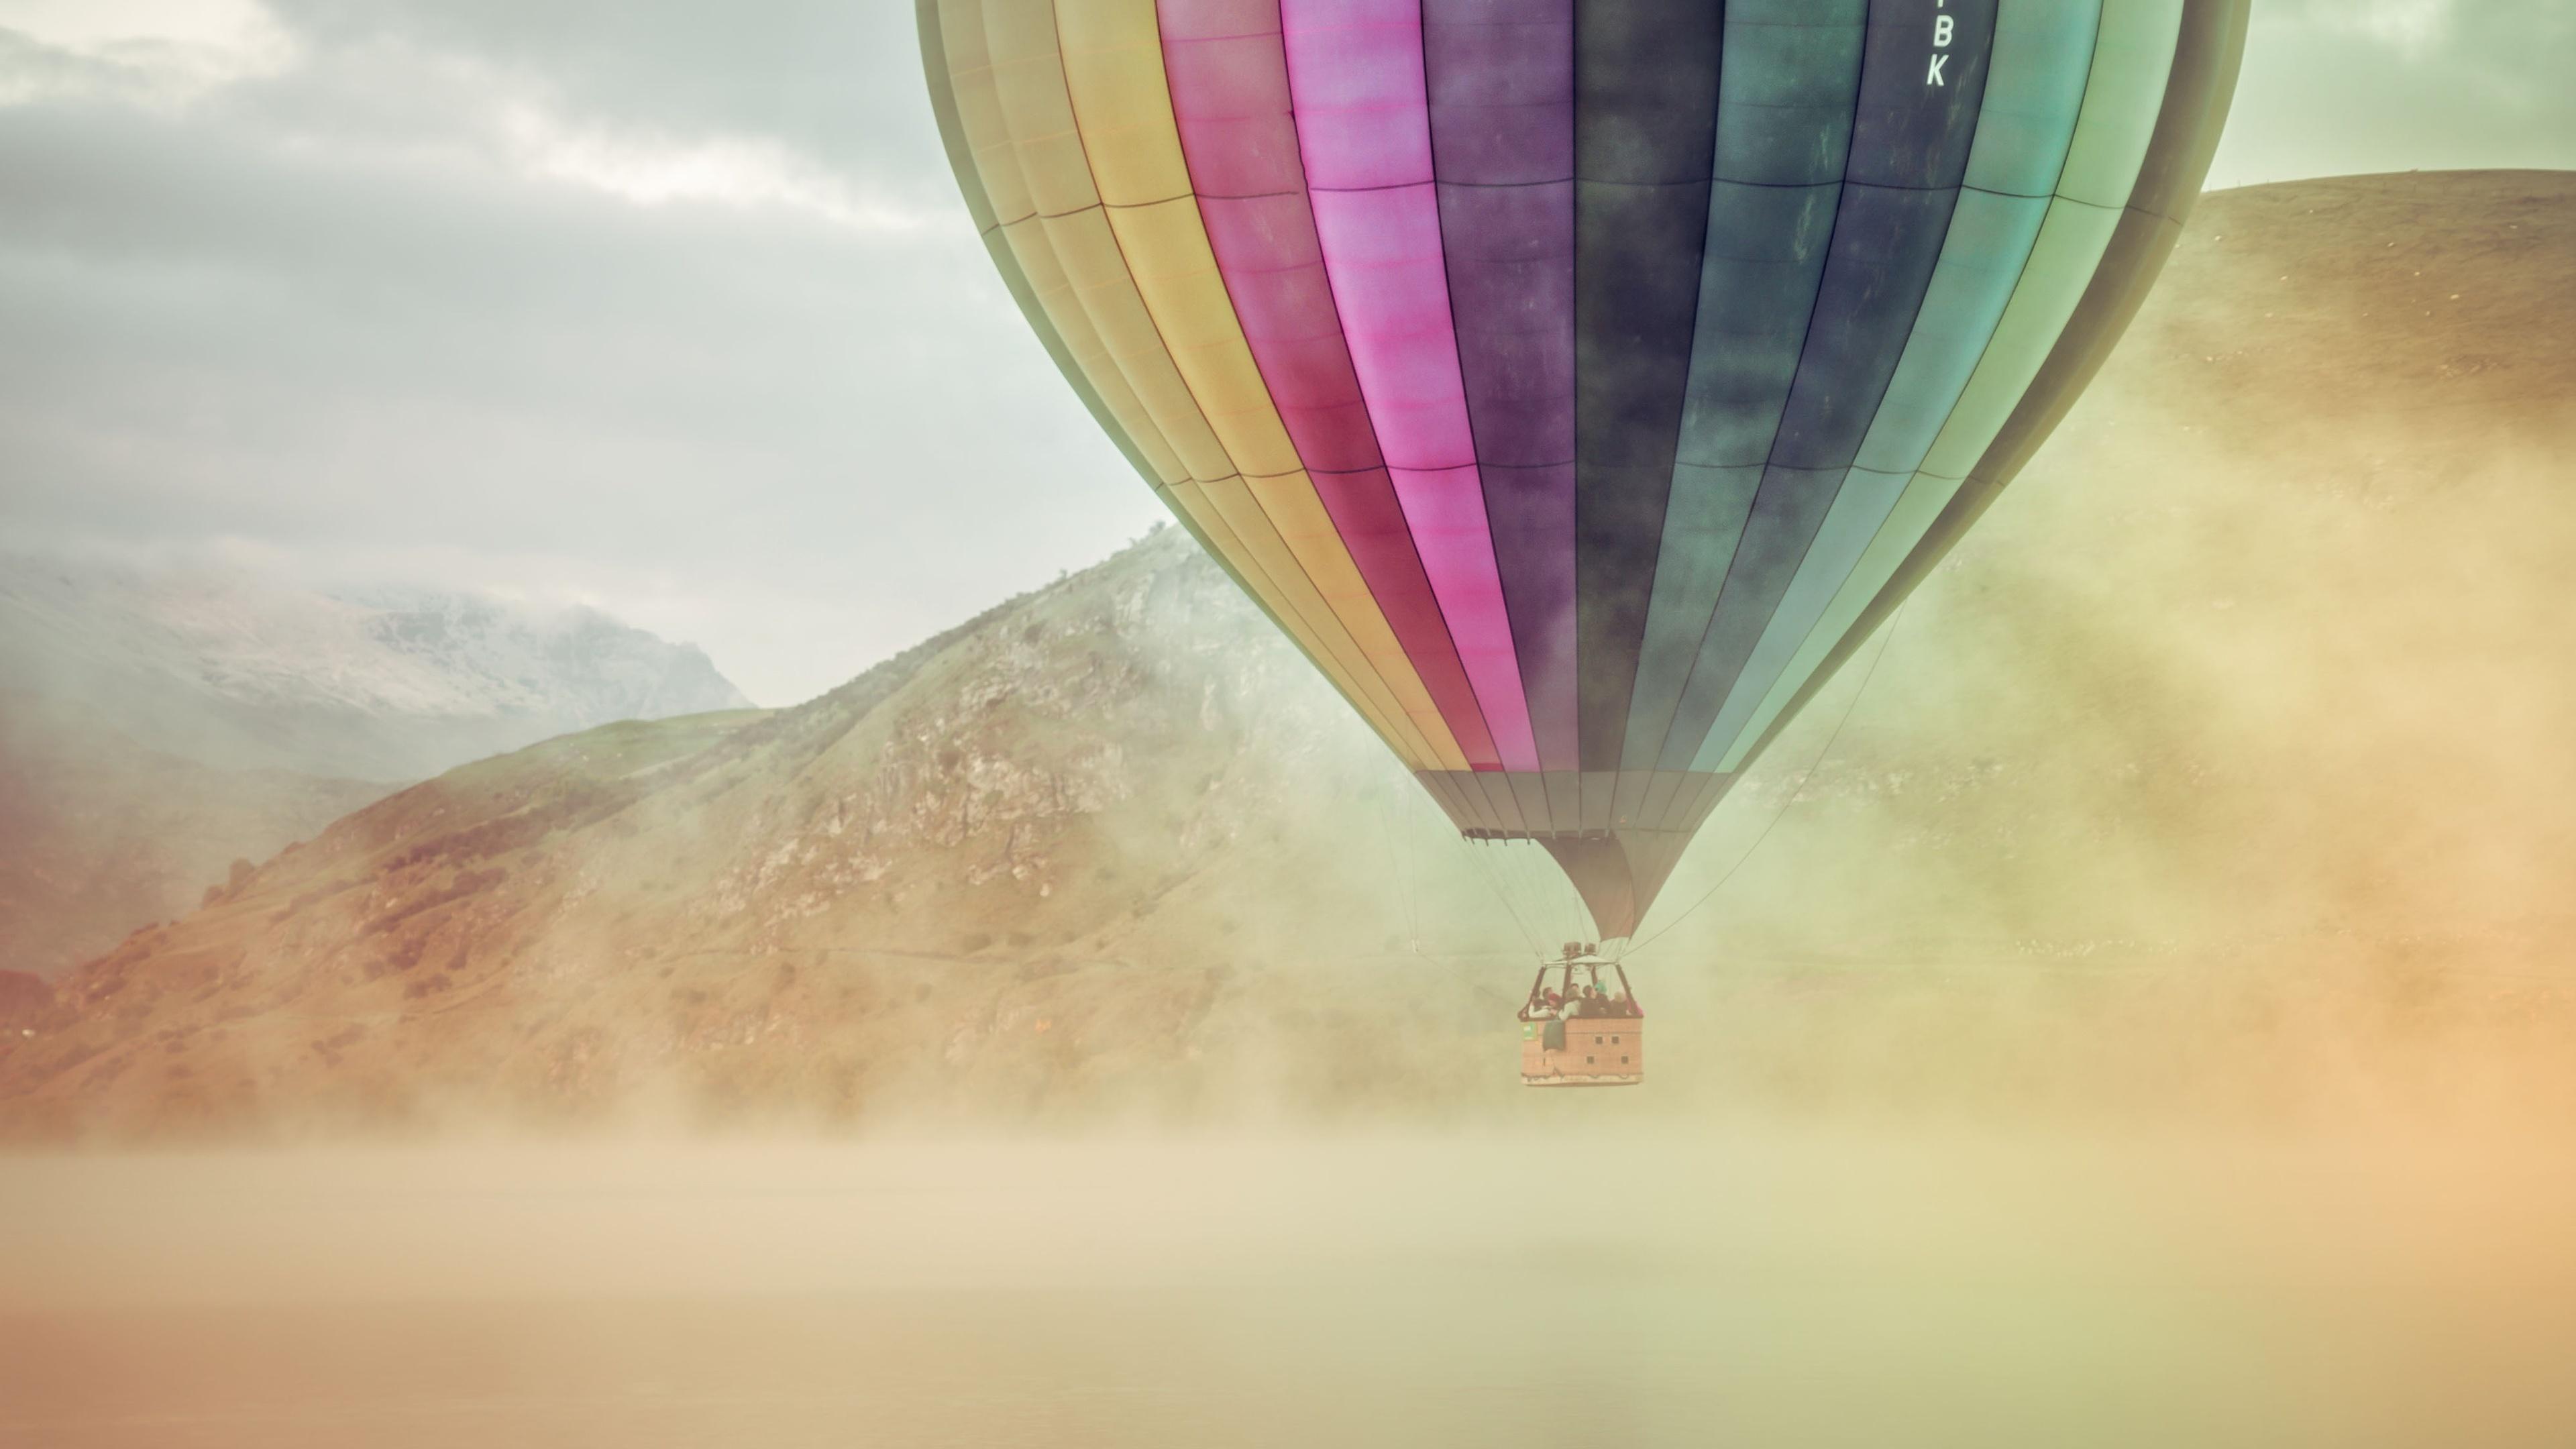 colorful hot air balloon 4k 1540136234 - Colorful Hot Air Balloon 4k - nature wallpapers, hd-wallpapers, colorful wallpapers, air balloon wallpapers, 4k-wallpapers